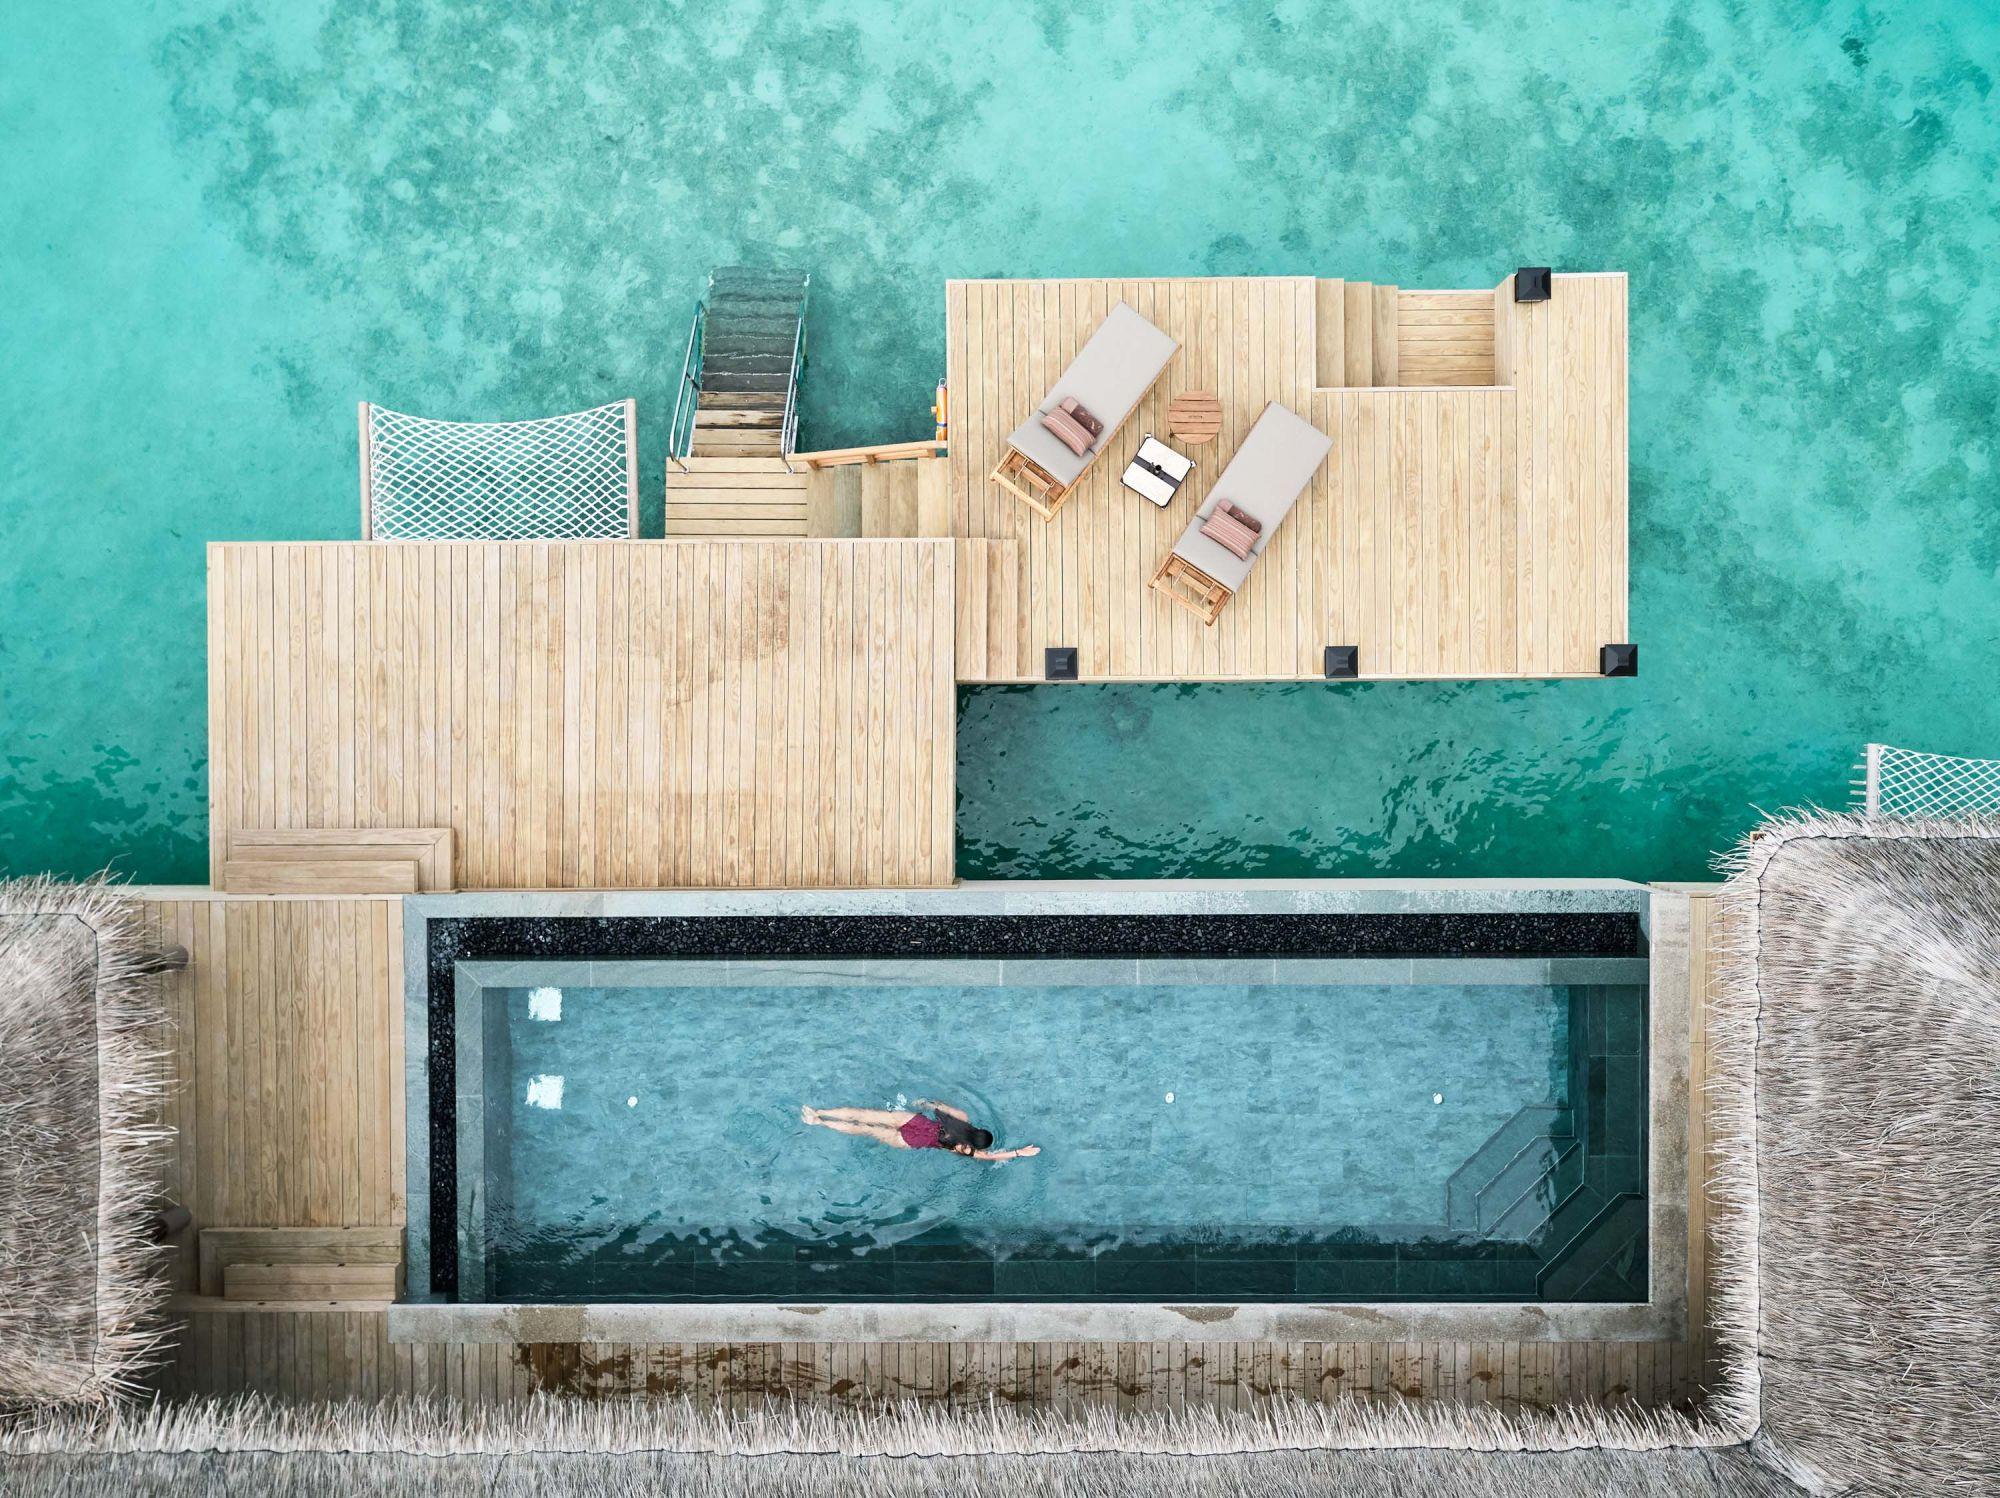 Hotel Review: Tatler Checks Into... Joali Maldives, An Art-Inspired Island Resort